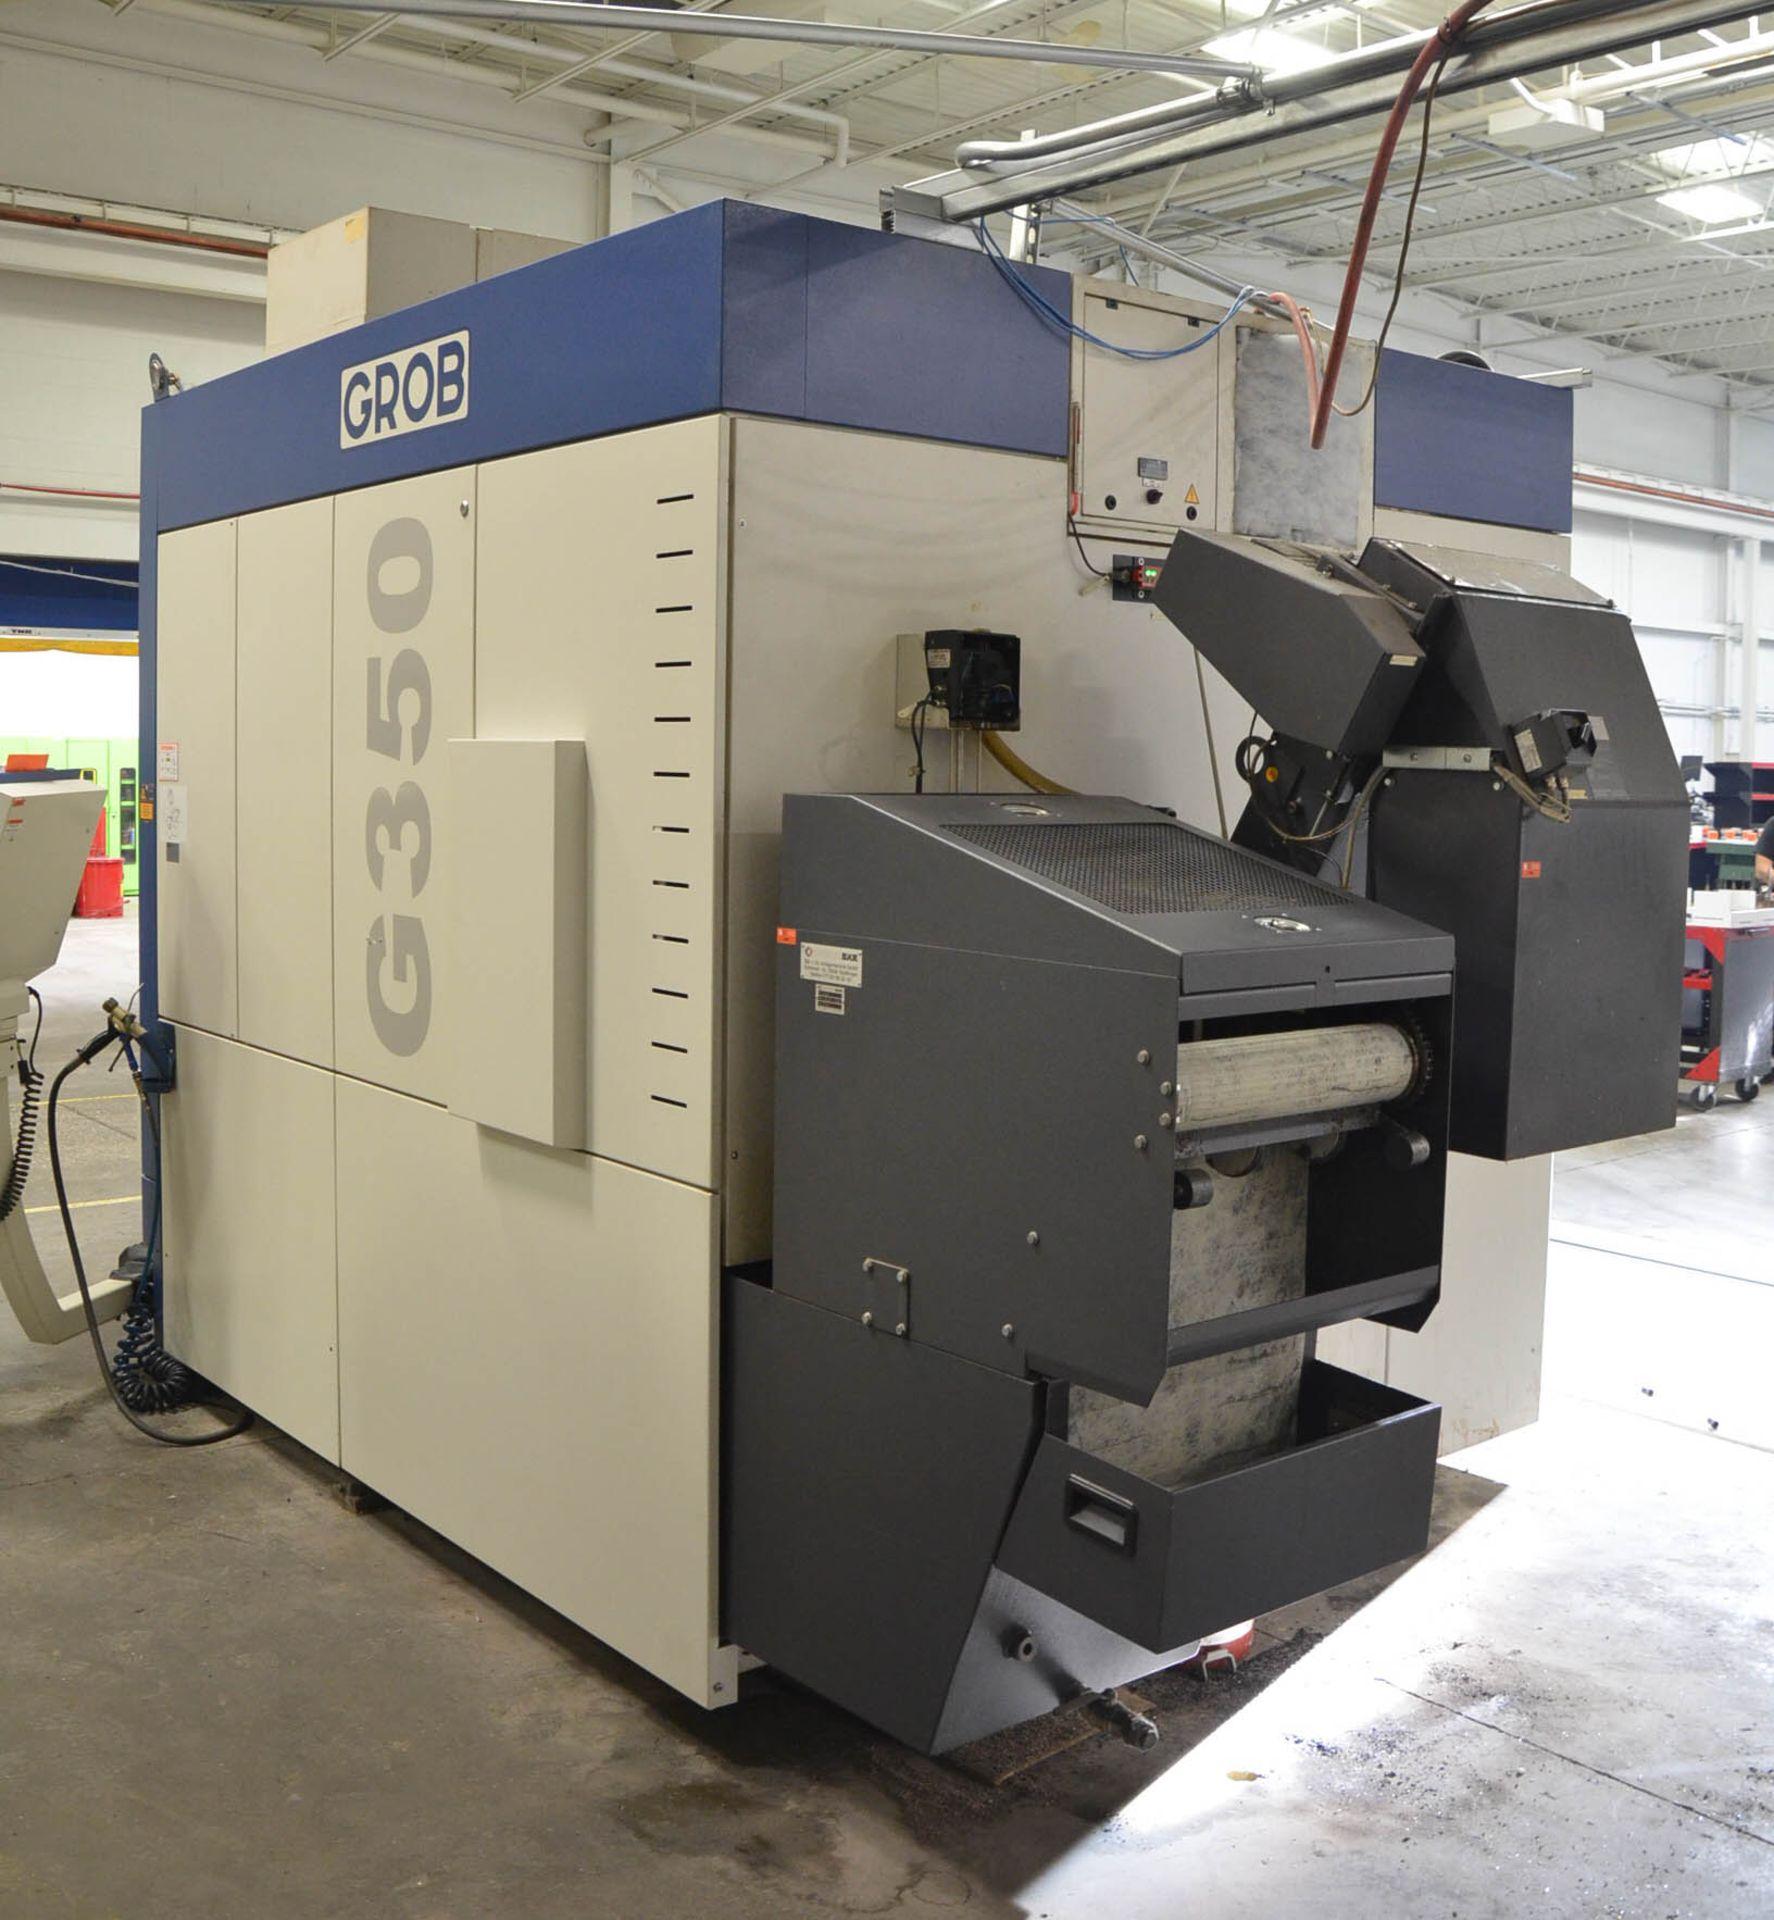 "GROB (2012) G350 5-AXIS CNC MACHINING CENTER WITH HEIDENHAIN ITNC 530 CNC CONTROL, 22.25"" DIAMETER - Image 9 of 12"